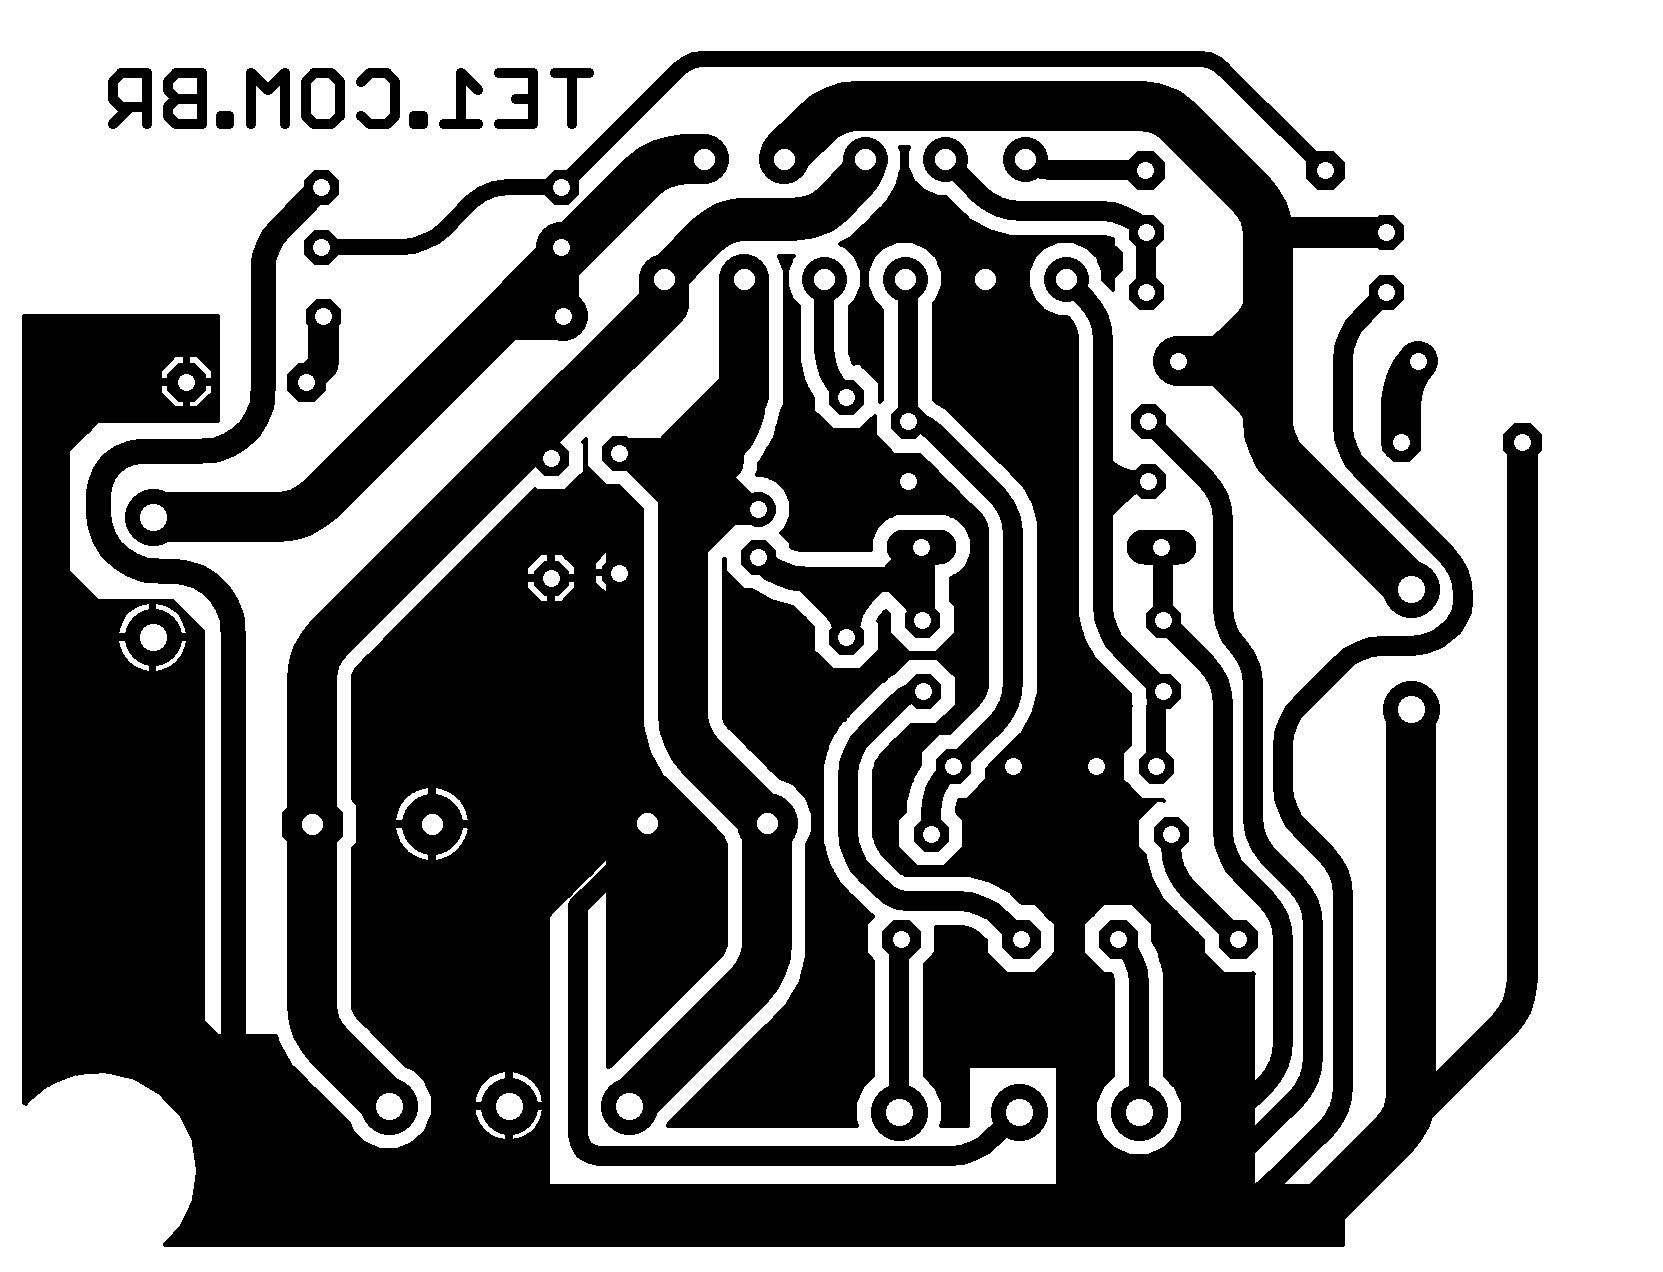 Amplificador Potncia Estreo Com Ci Tda7265 25 W 60 Watts Audio Amplifier Circuit Using Tda7296 Class Ab Estereo Potencia Placa Circuito 700x477 De